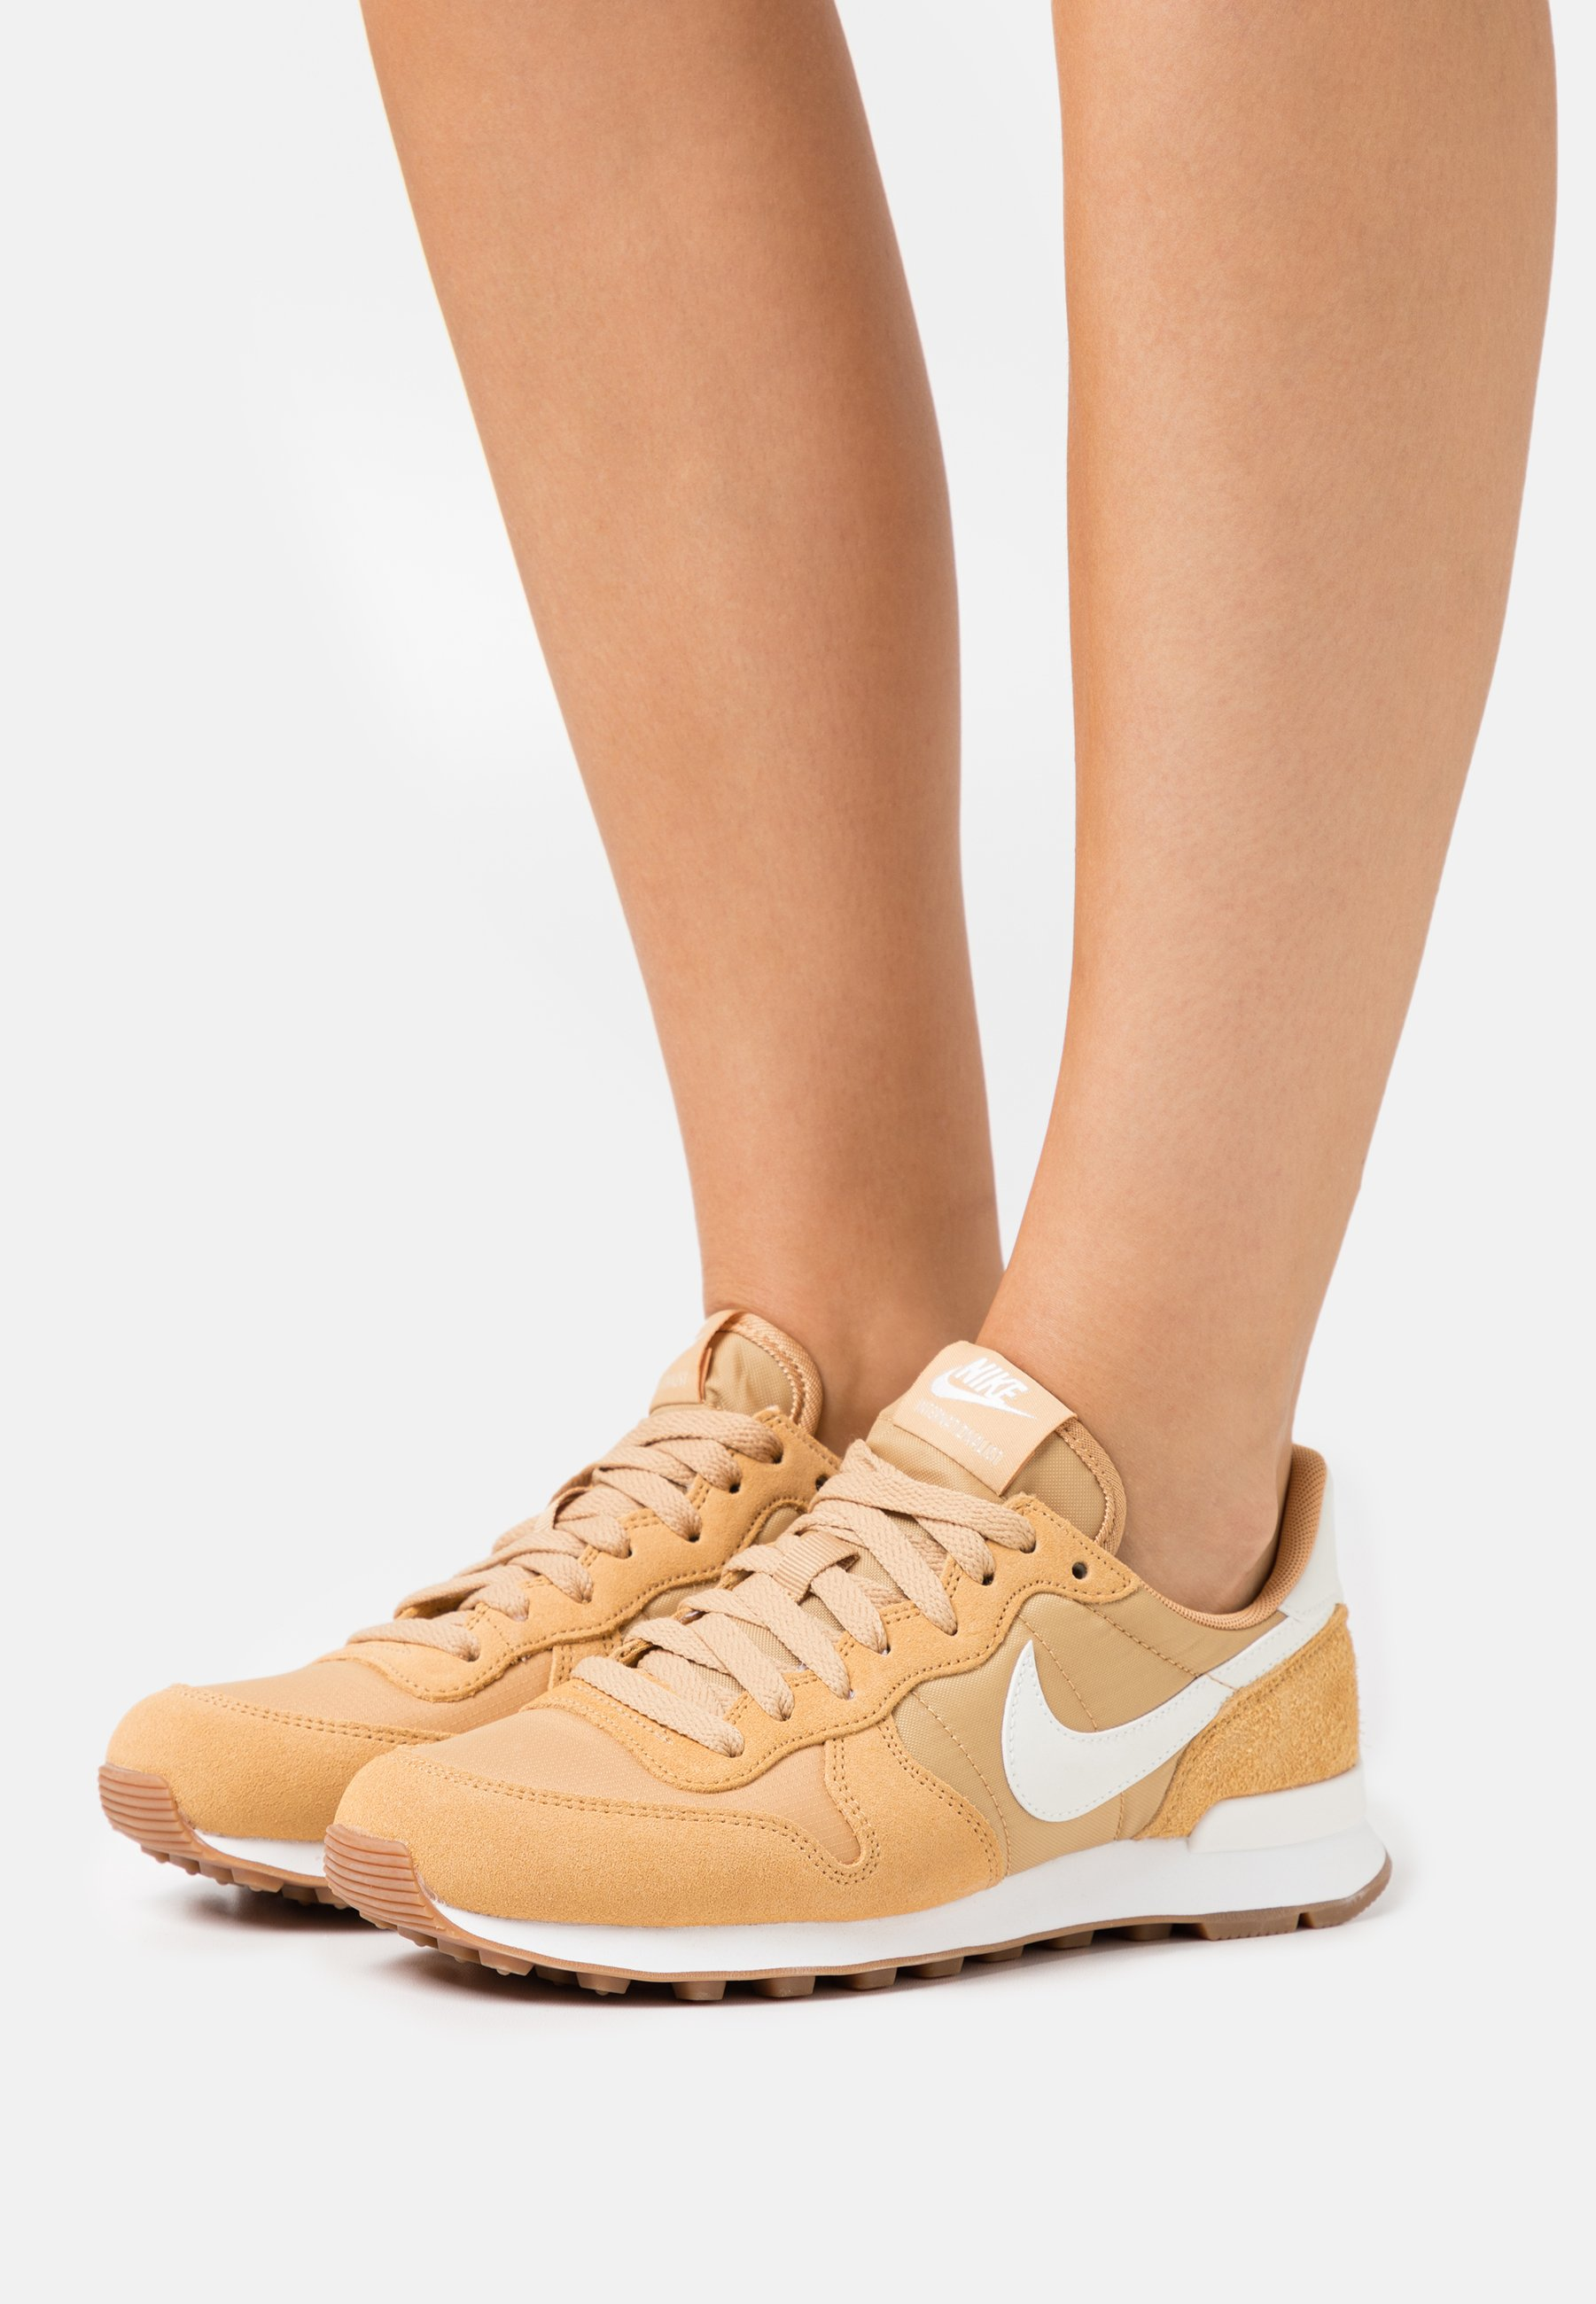 Crueldad Cíclope Shipley  Nike Sportswear INTERNATIONALIST - Zapatillas - twine/summit  white/black/amarillo - Zalando.es